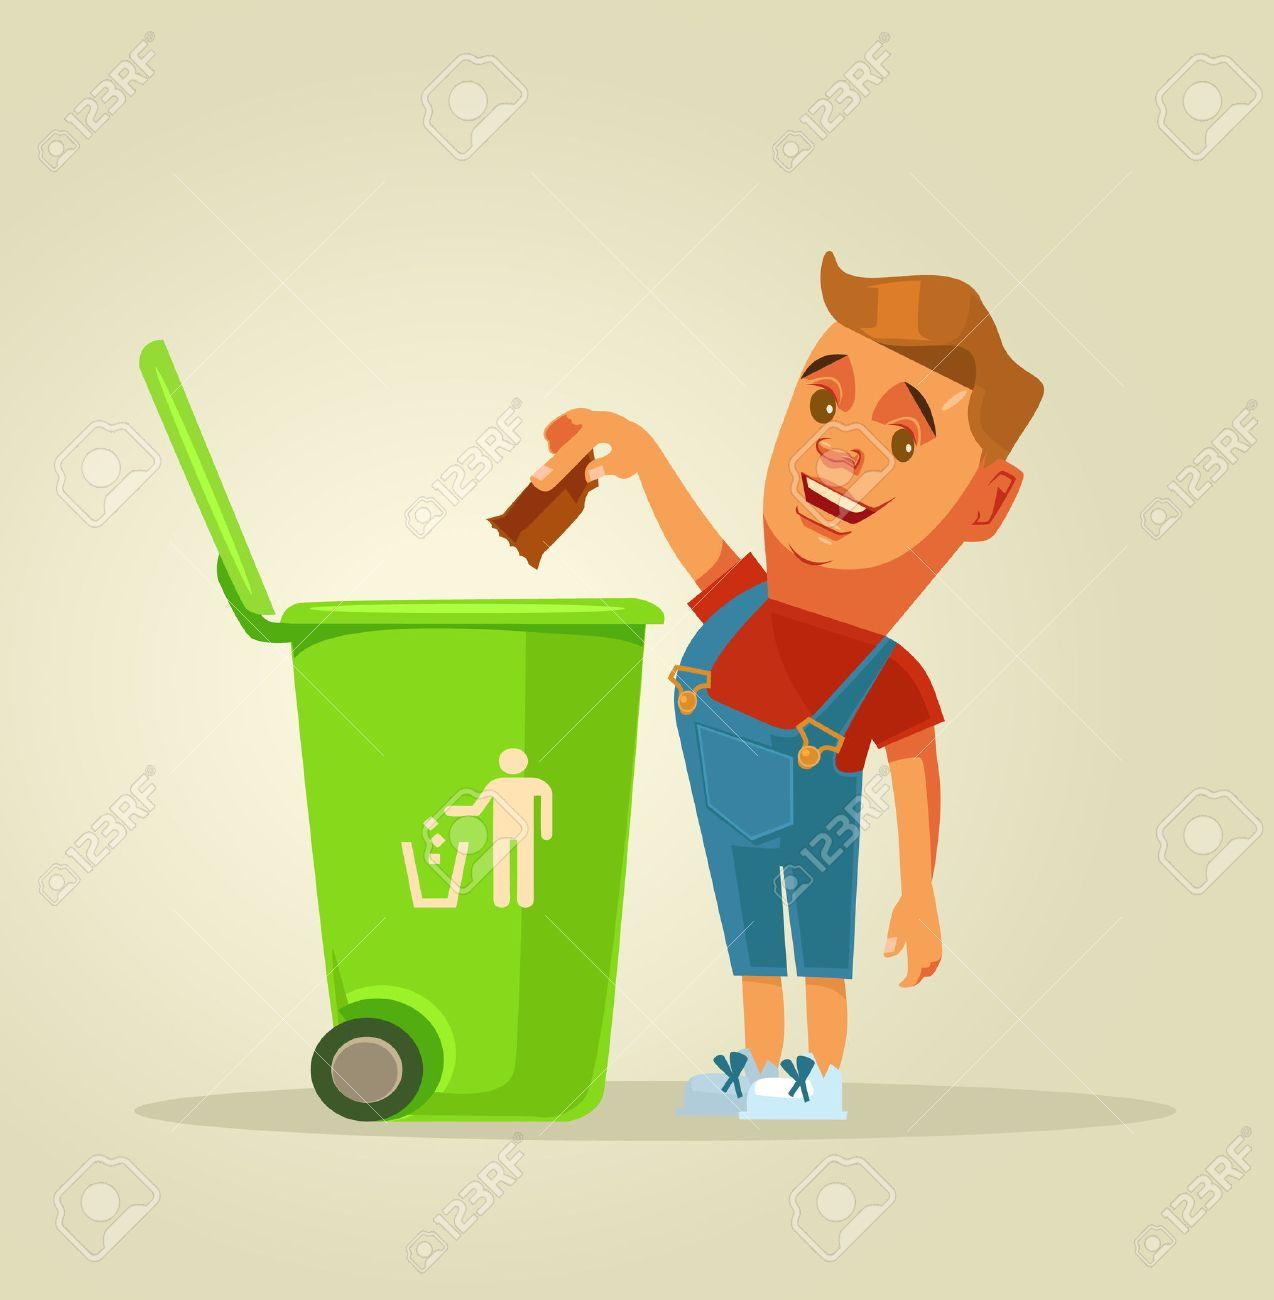 Boy character throws garbage in trash. Vector flat cartoon illustration - 71547003